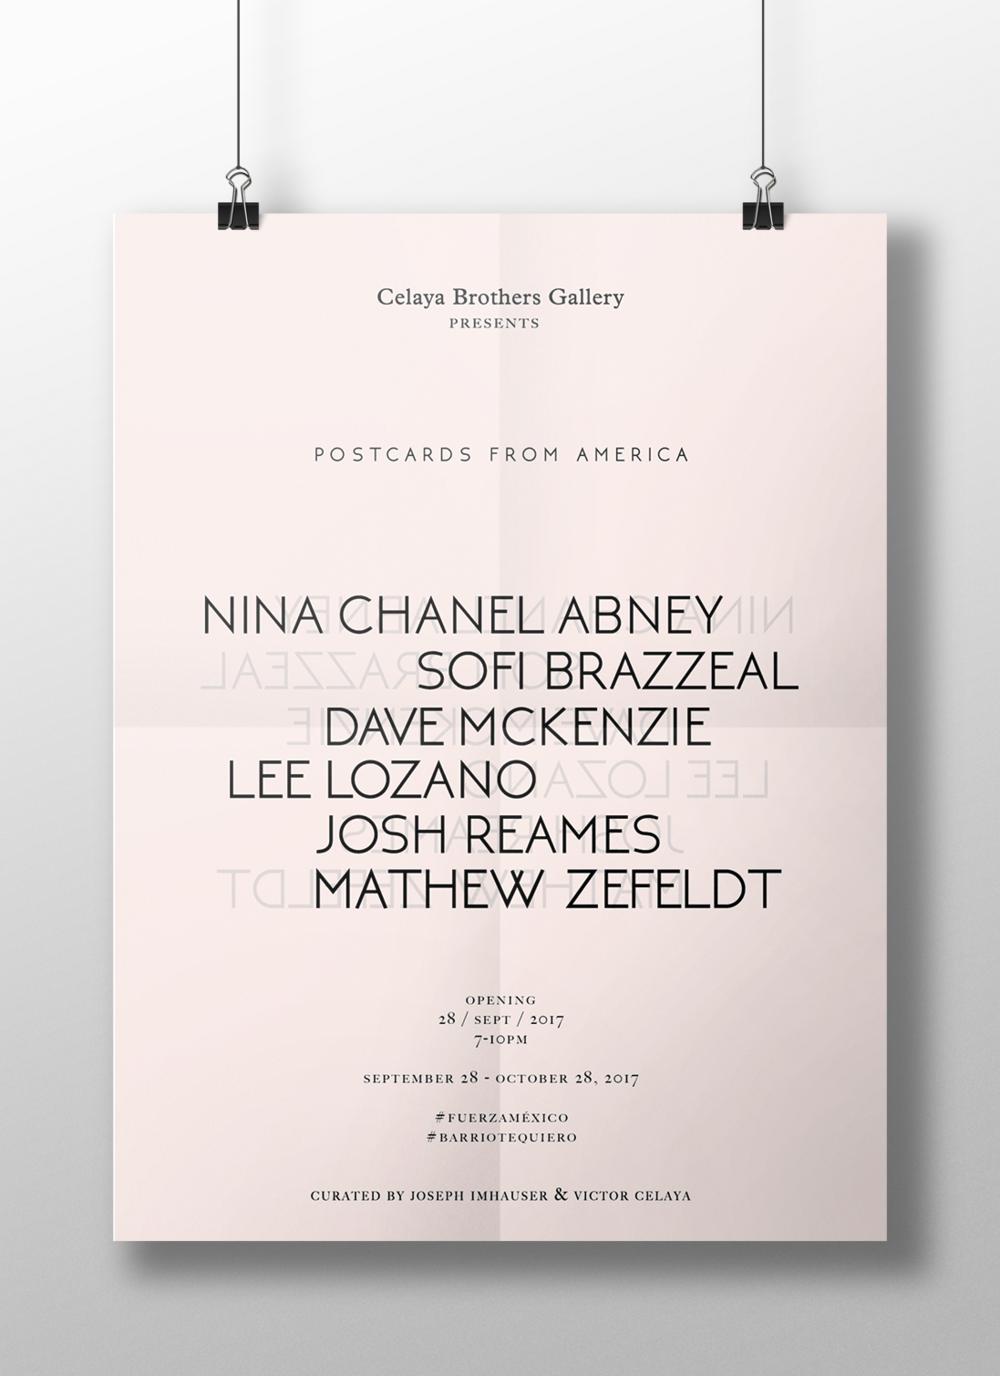 postcards from america - exhibition design, branding